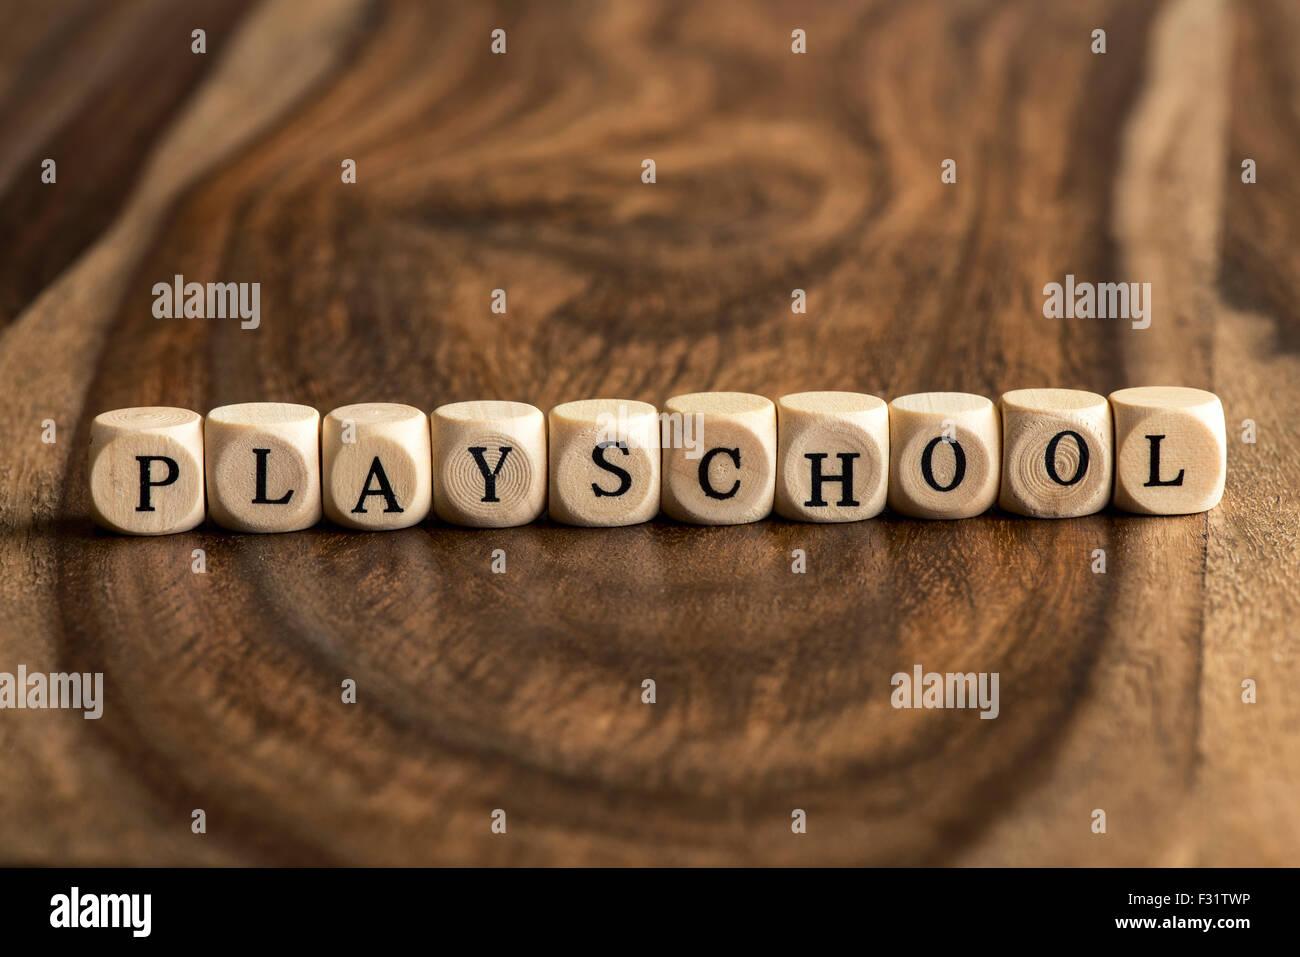 PLAYSCHOOL word background on wood blocks - Stock Image